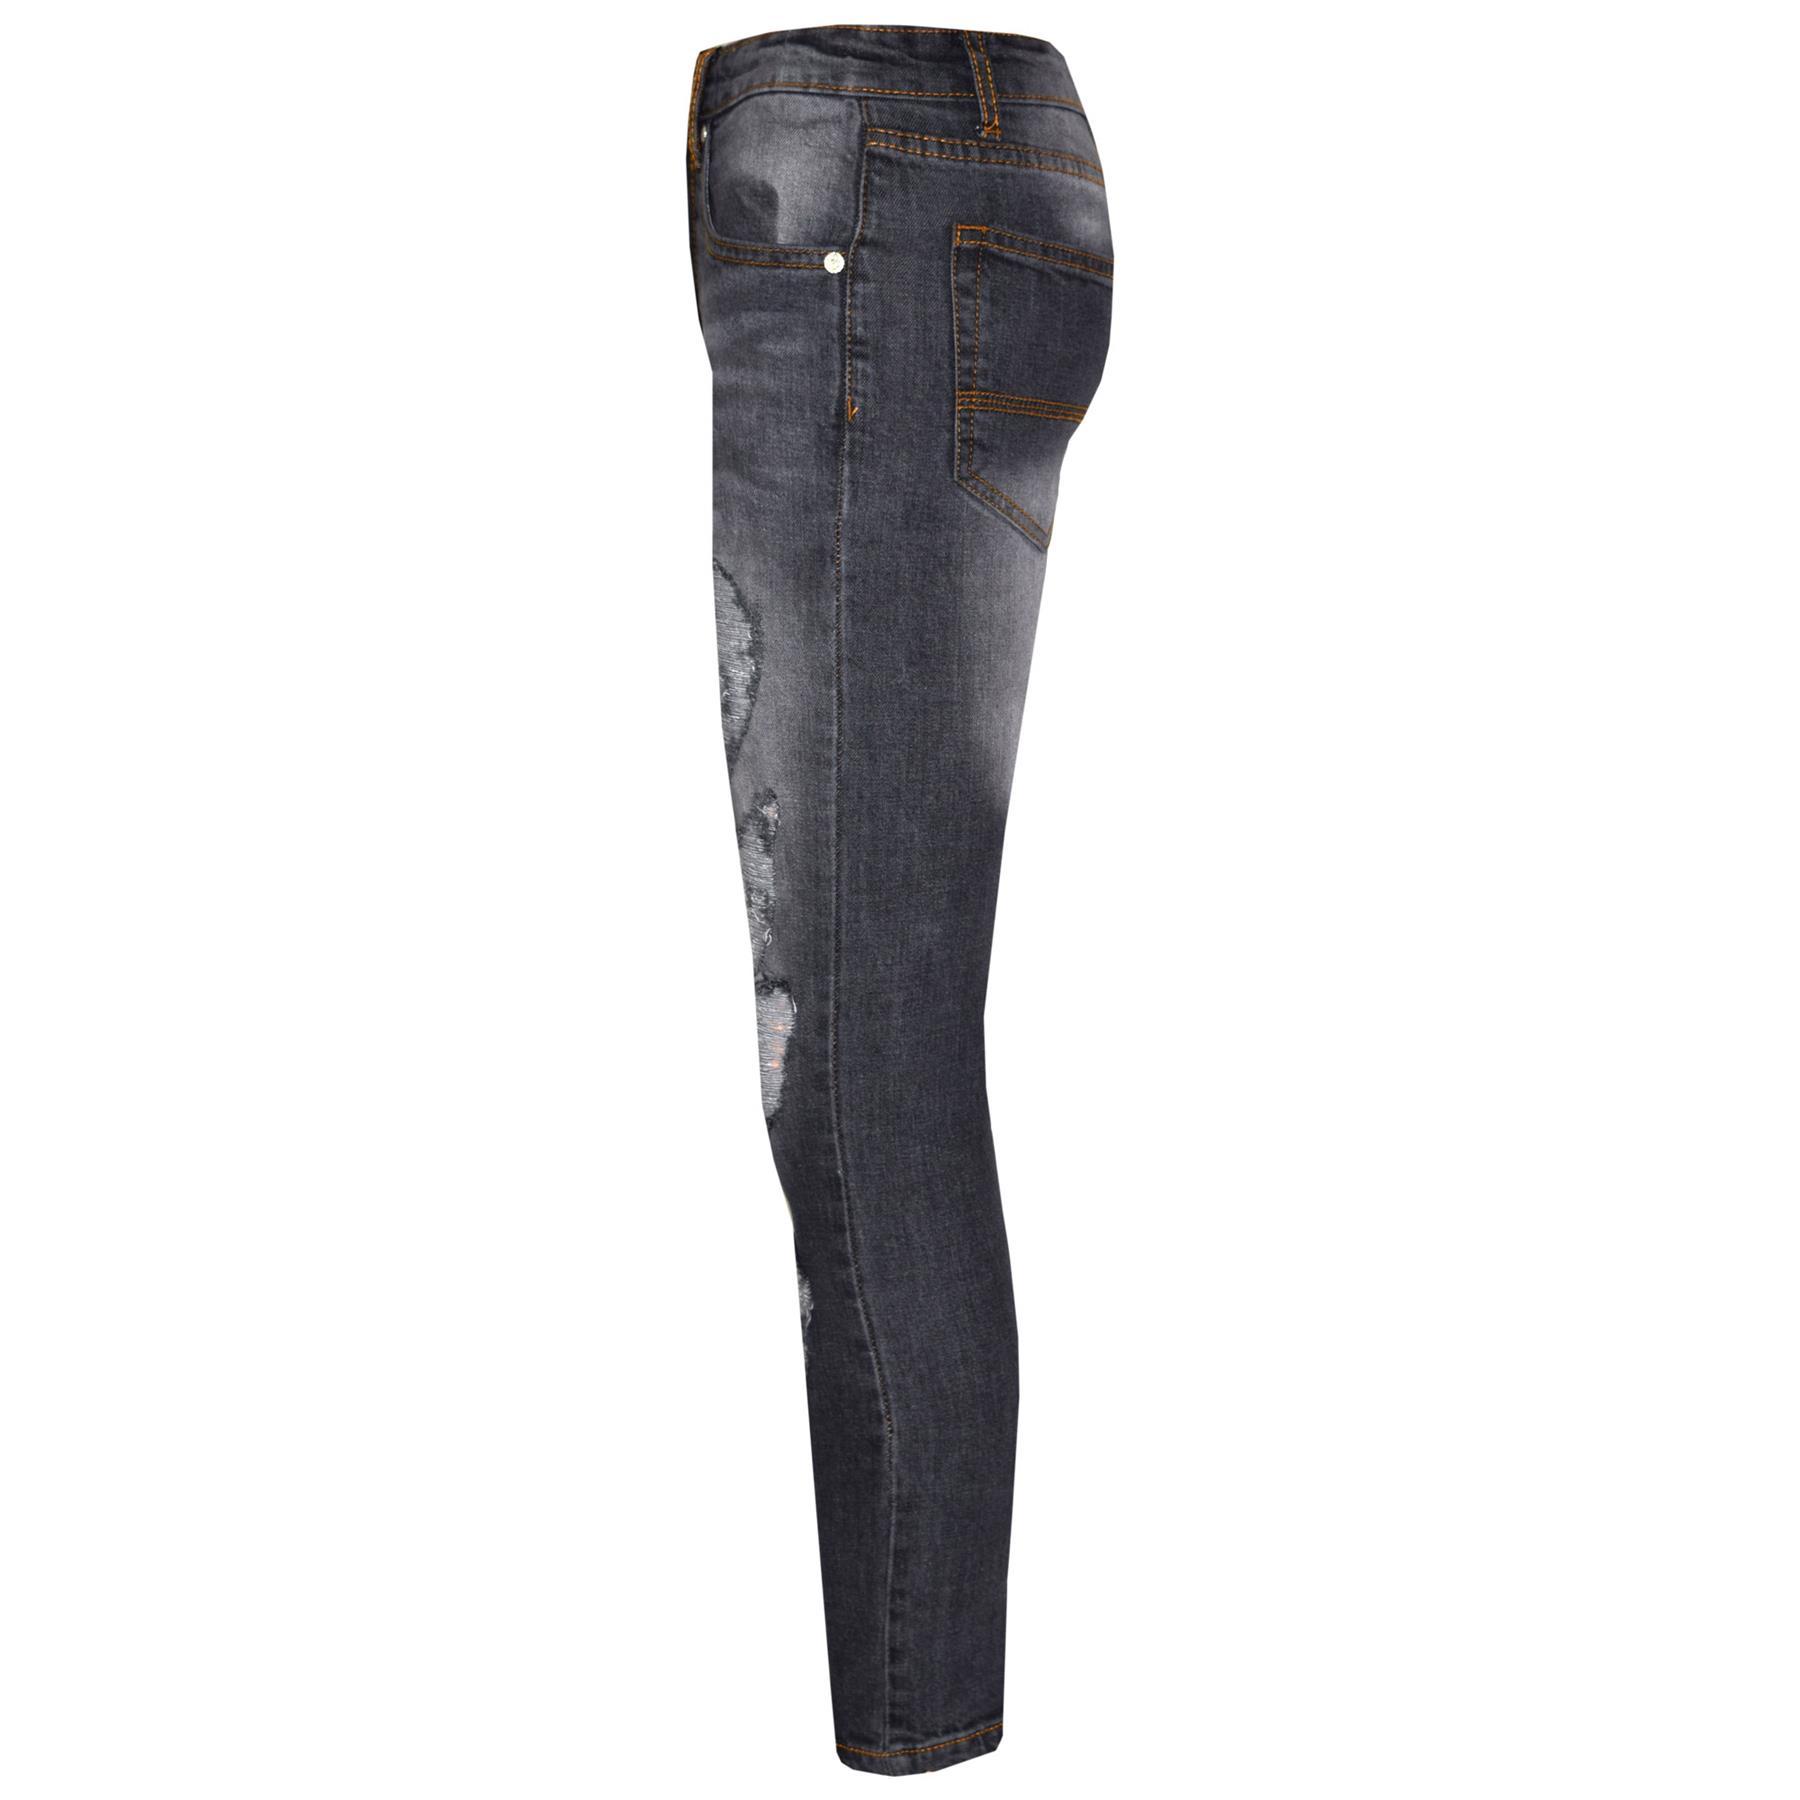 Kinder Stretch-Jeans Jungen Jeggings Zerrissen Skinny Hosen Alter 5-12 Jahr